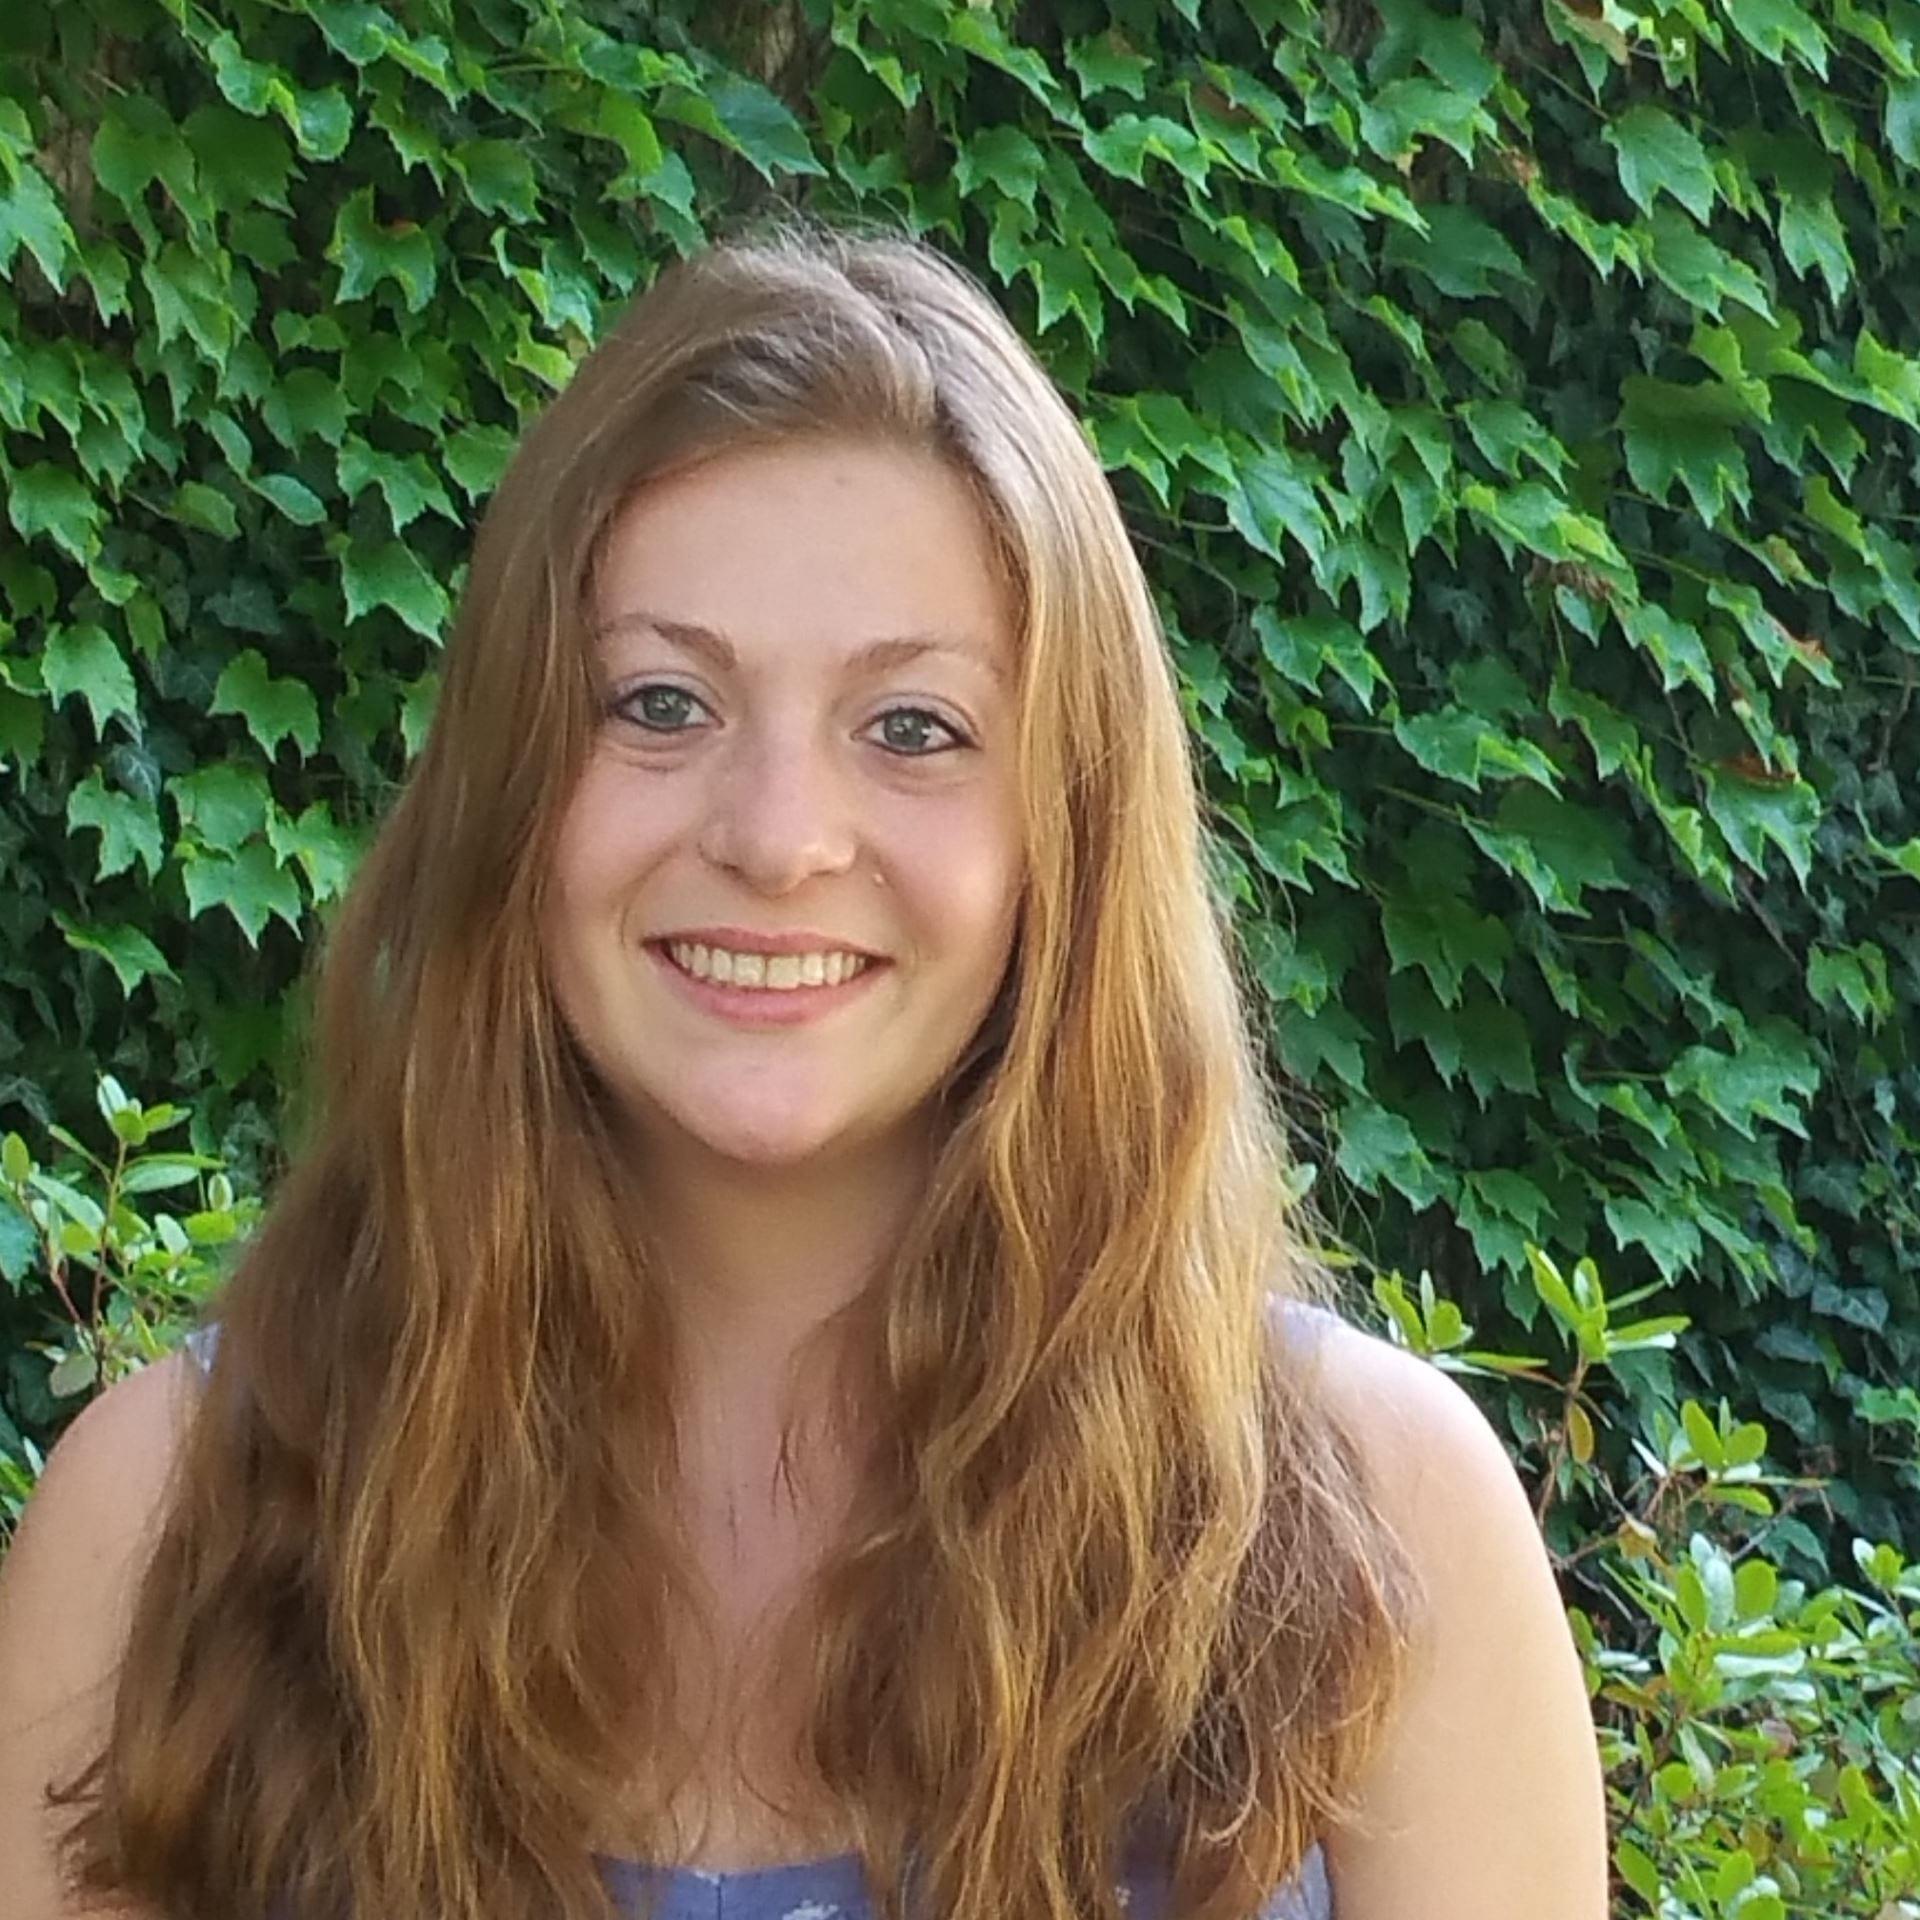 Kate Jesse